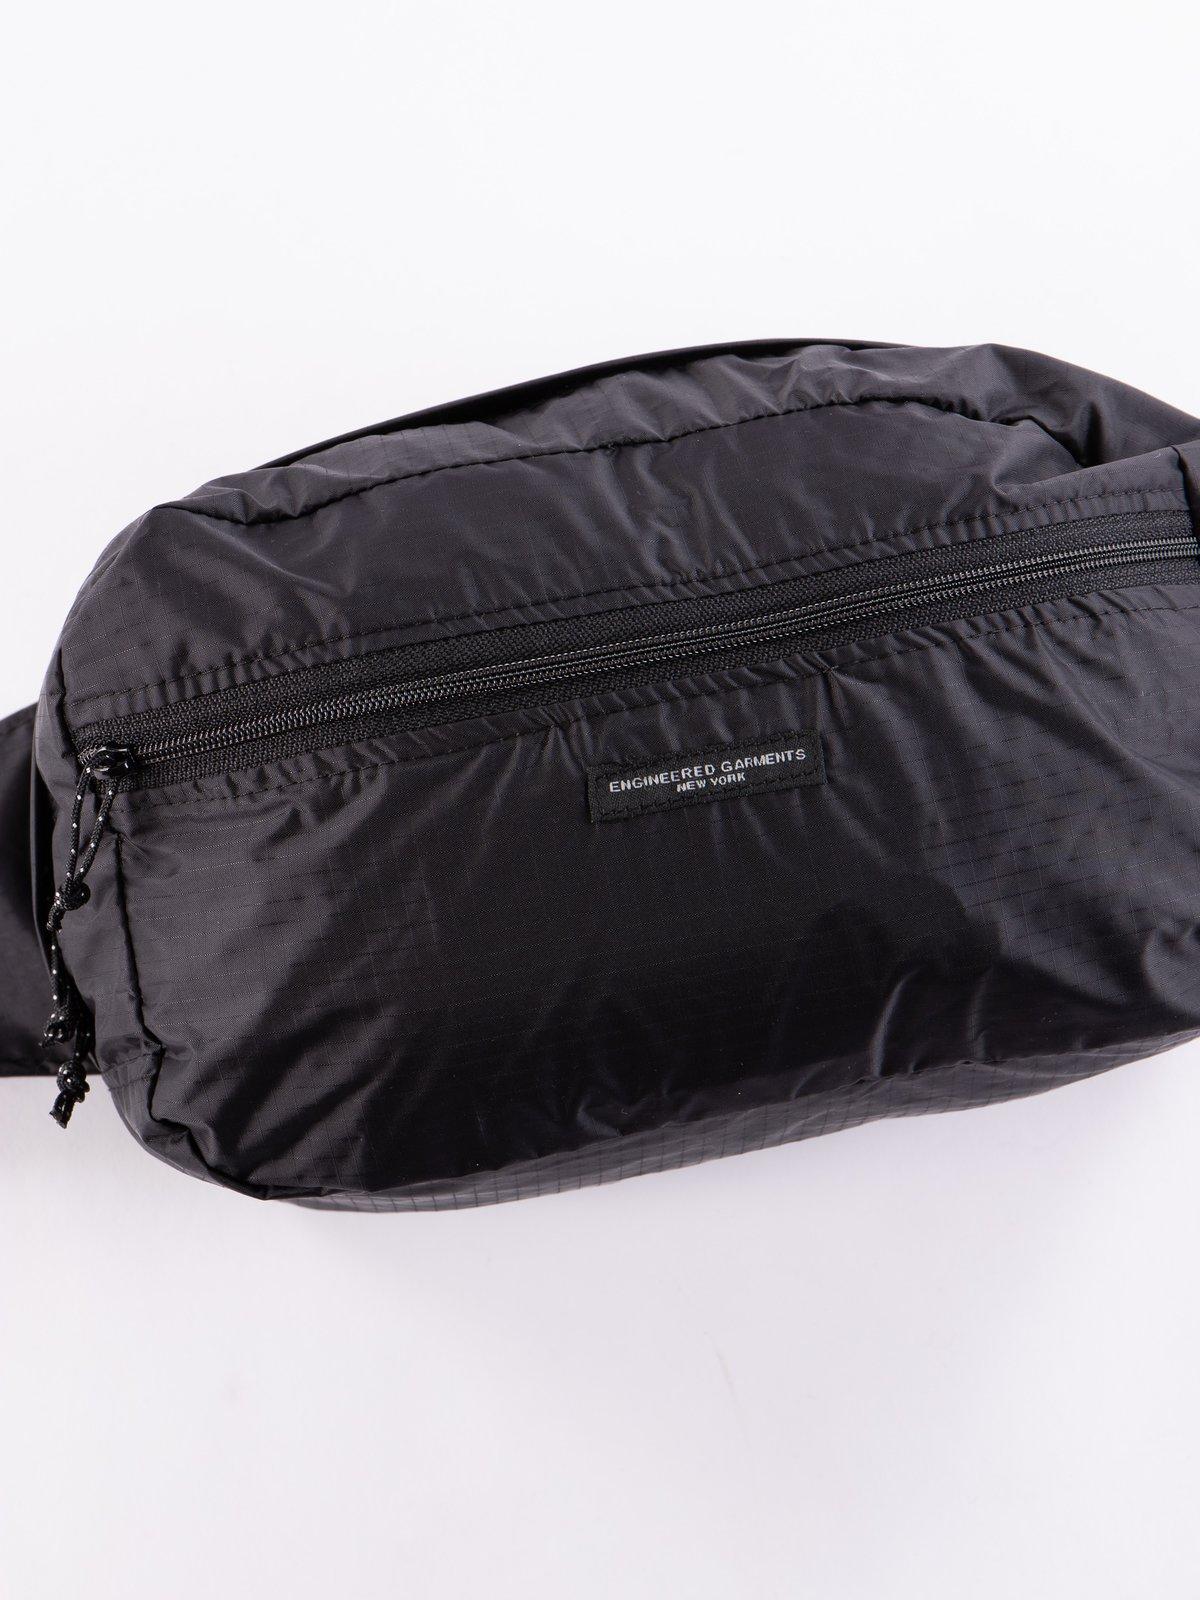 Black Nylon Ripstop UL Waistpack - Image 2